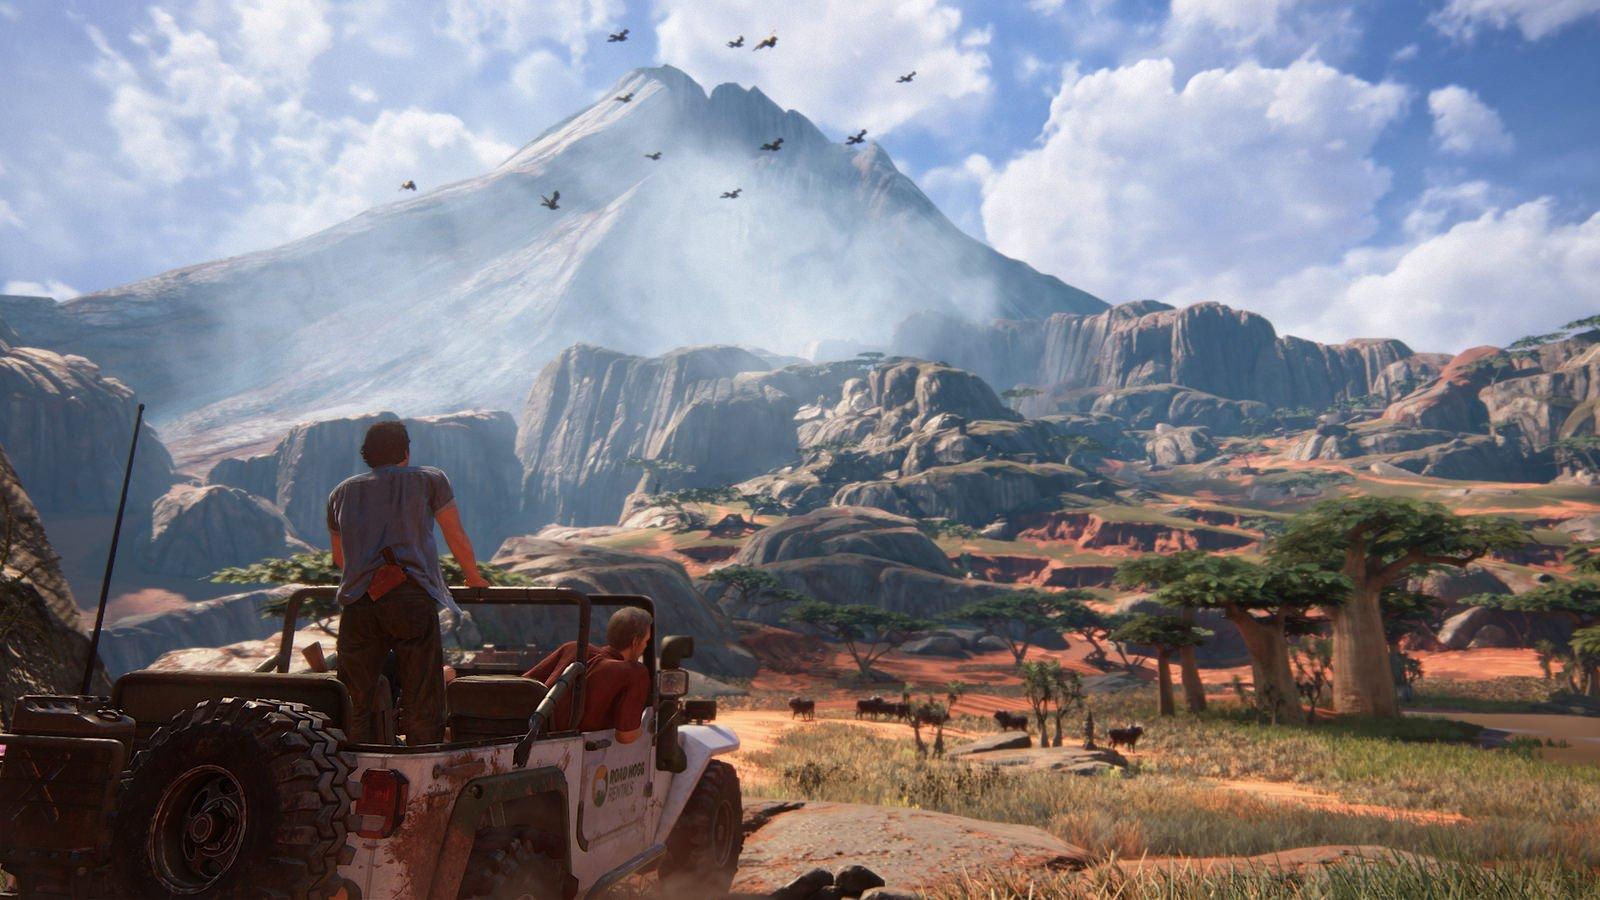 Uncharted4-AThief-sEnd PS4 Editeur 074